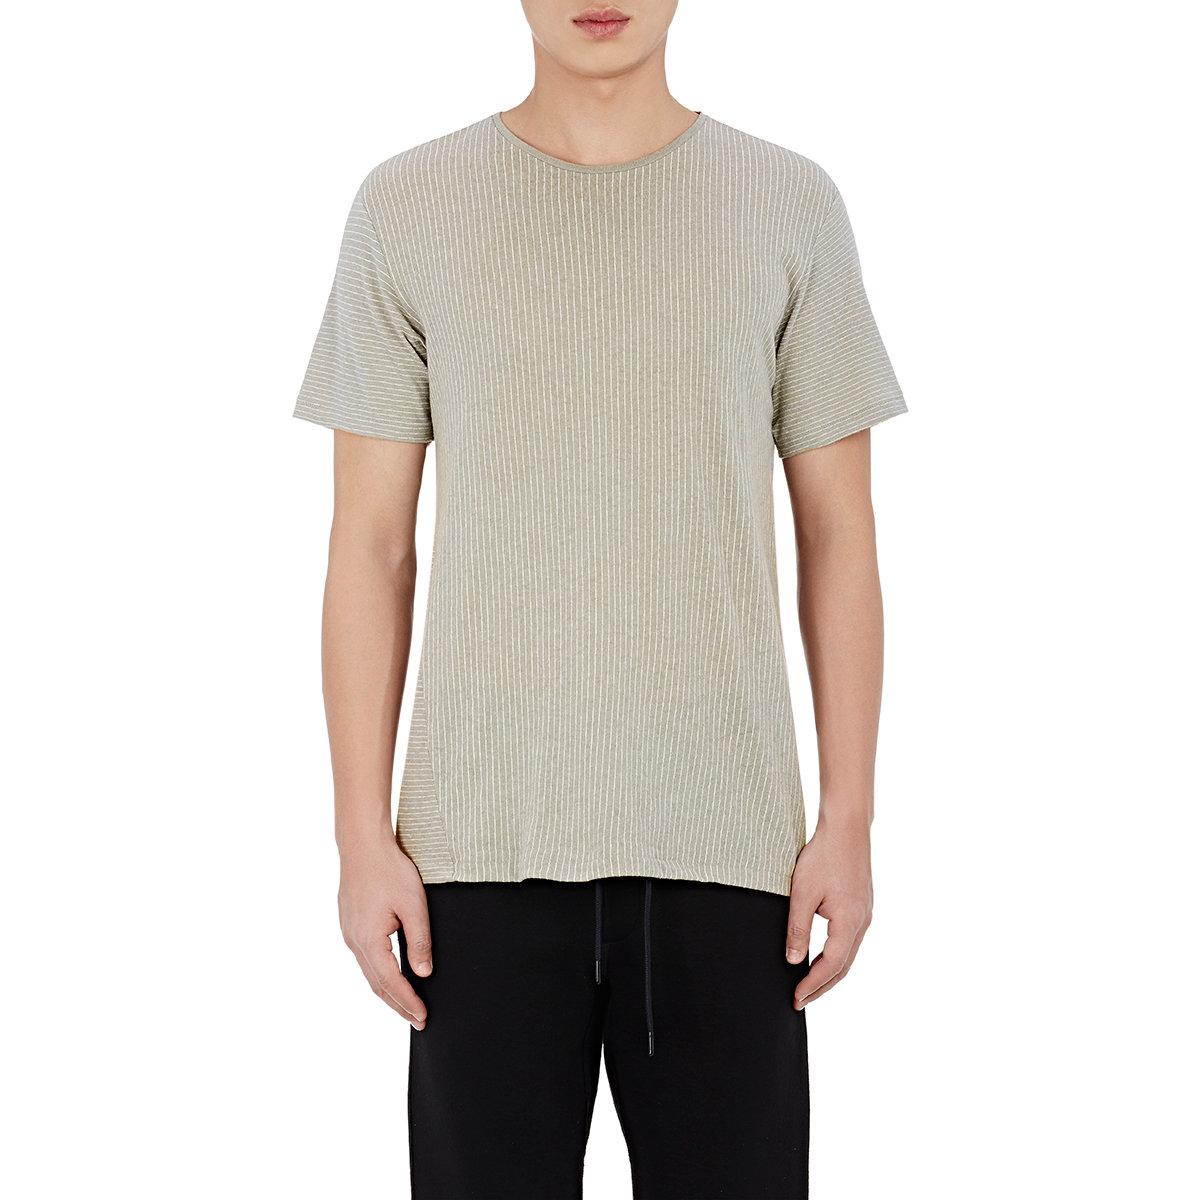 Rag bone men 39 s pinstriped jersey t shirt in gray for men for Rag bone shirt